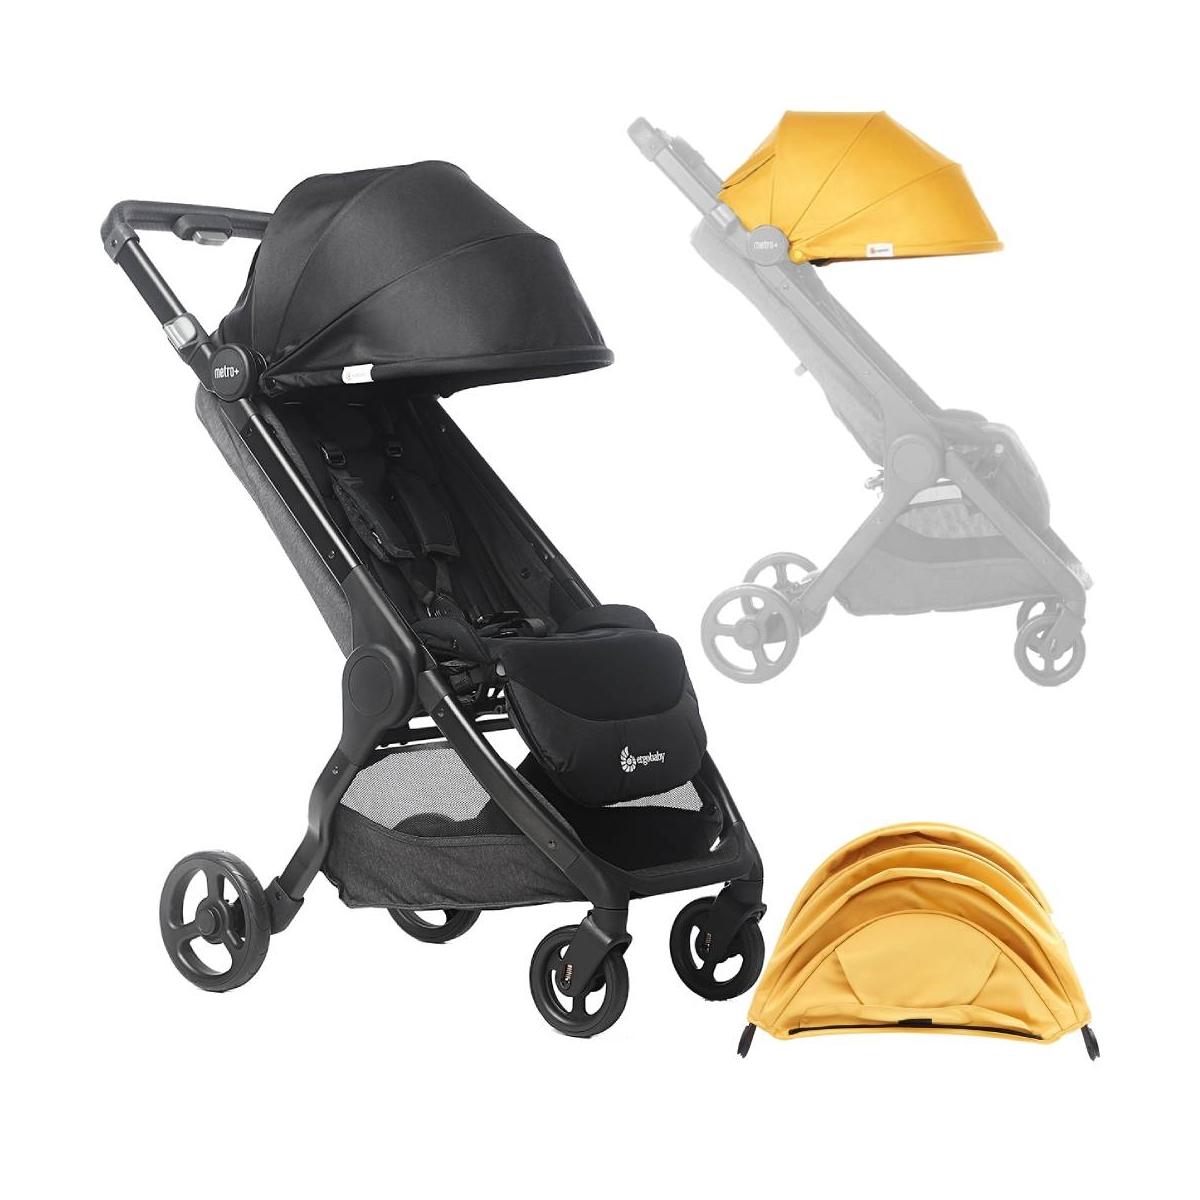 Ergobaby Metro+ Compact City Stroller-Black (2021)